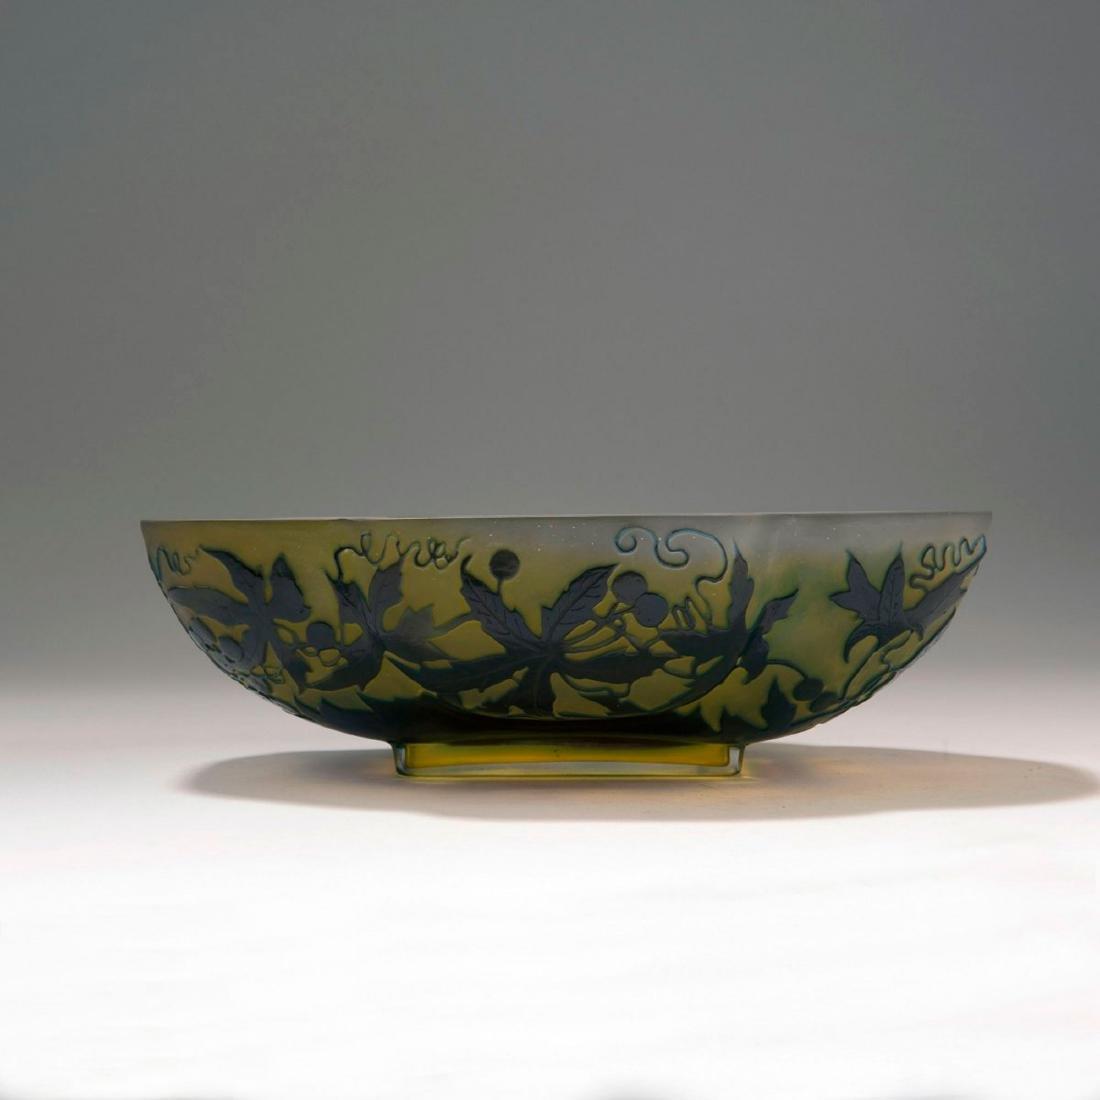 'Vigne vierge' bowl, 1906-14